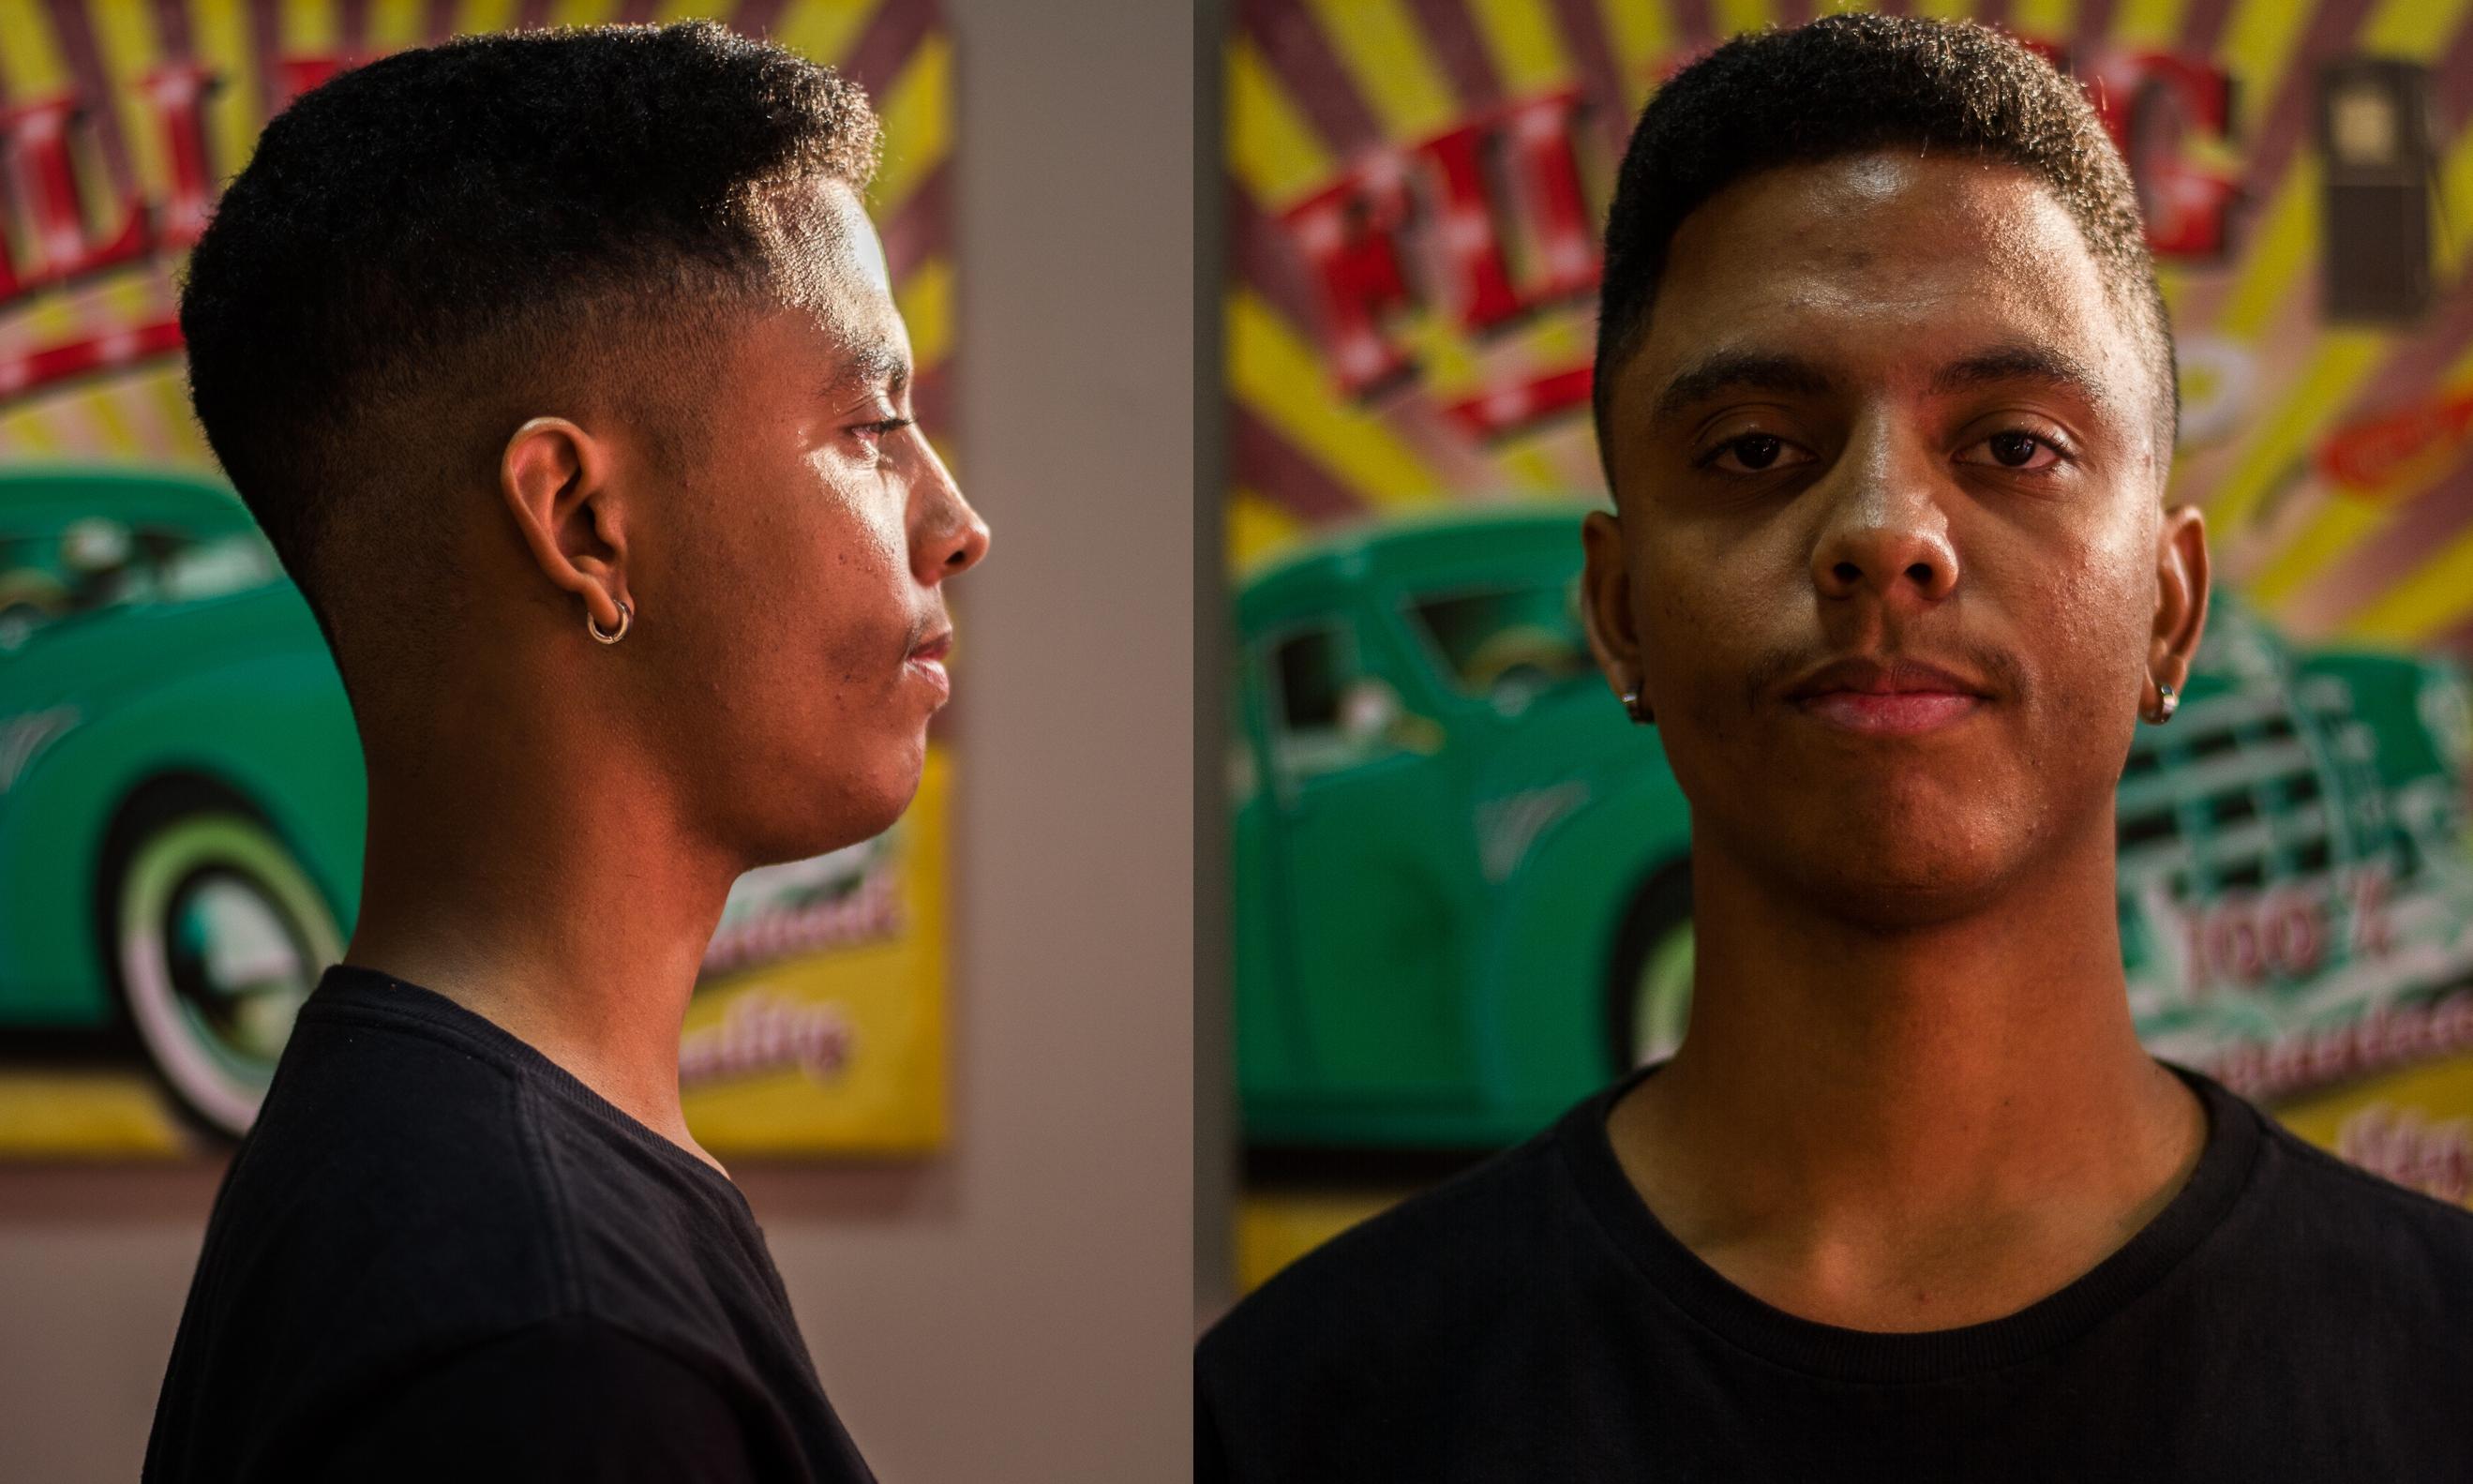 Corte De Cabelo Crespo Masculino 2017 Alex Cursino Blog